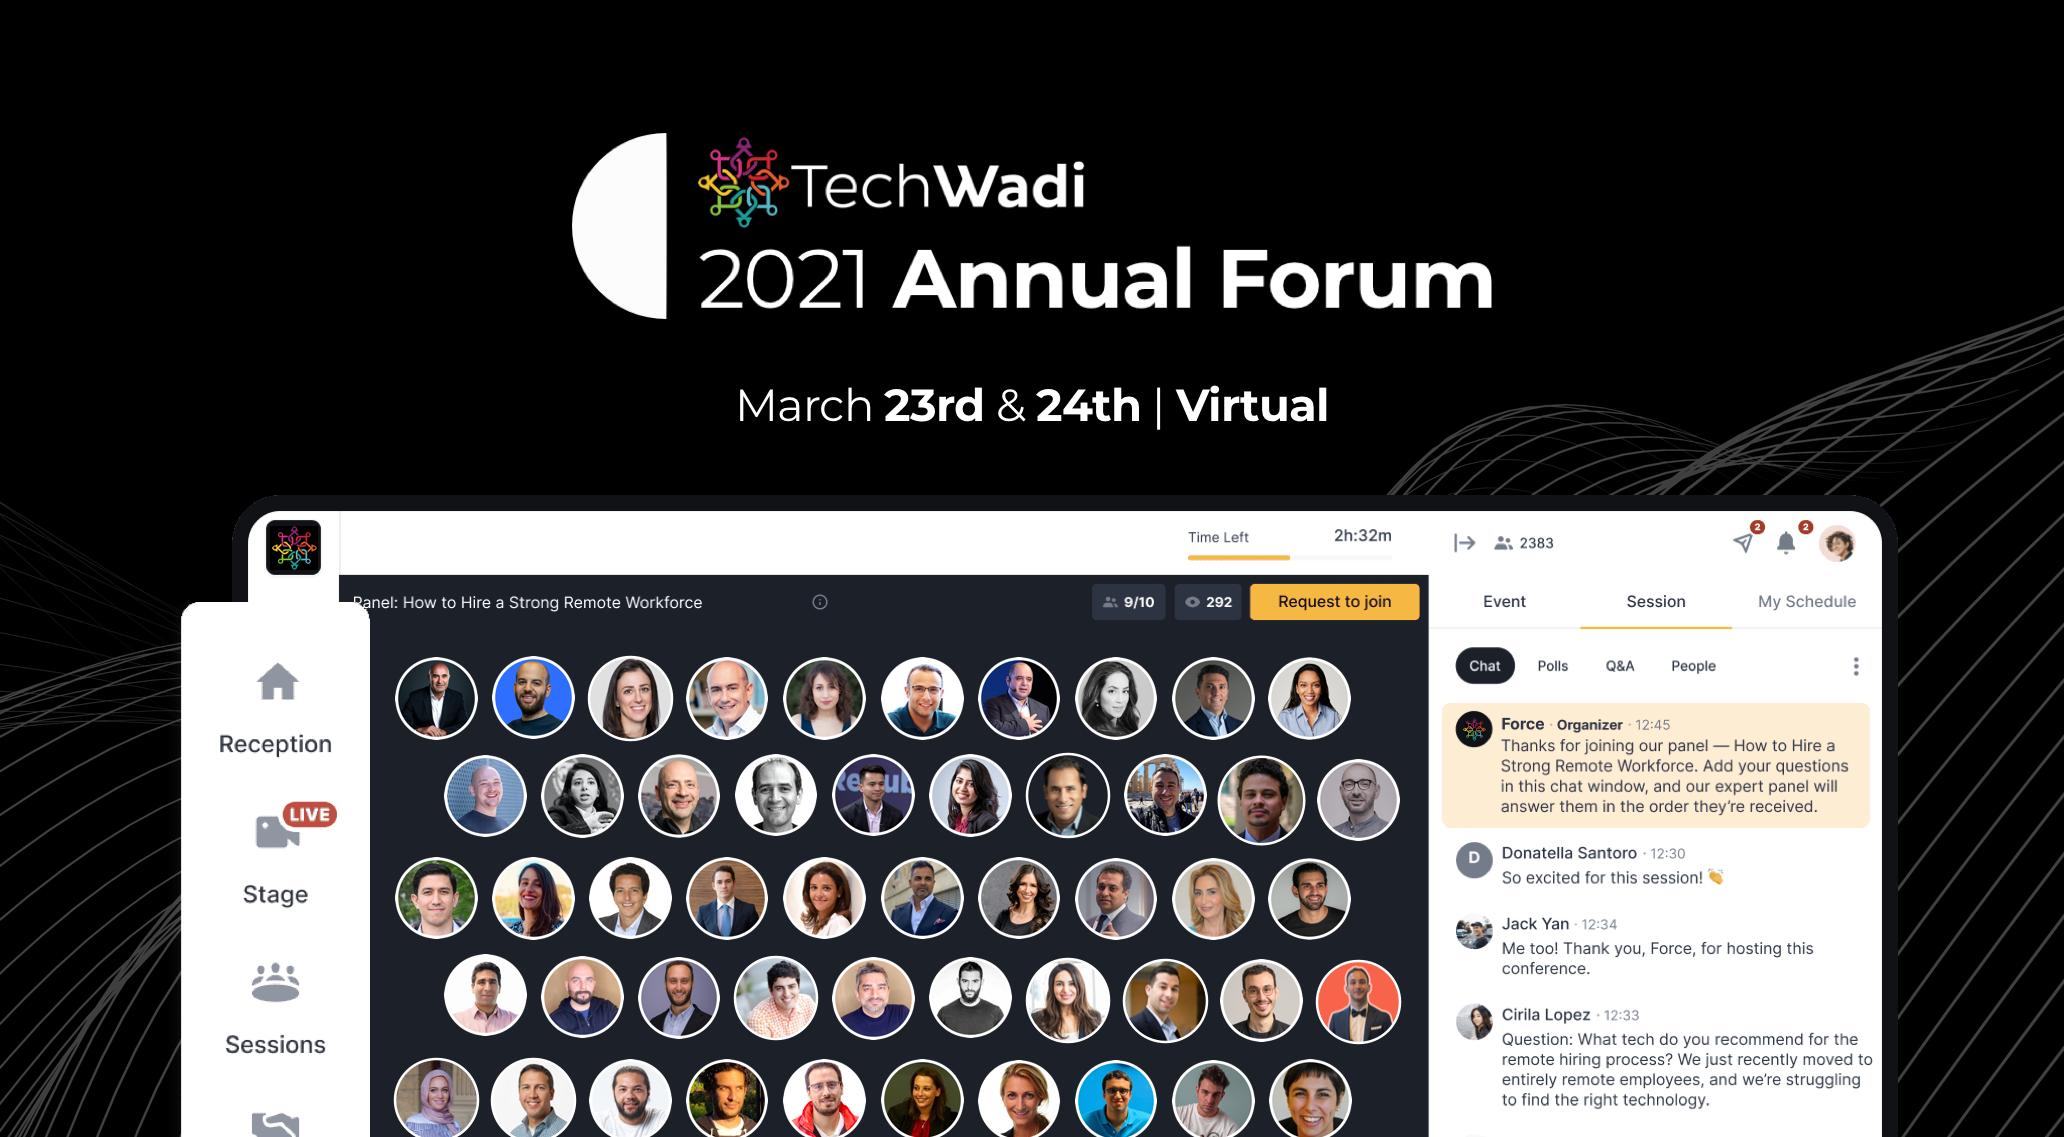 TechWadi '21: the virtual tech conference bridging Silicon Valley & the MENA region